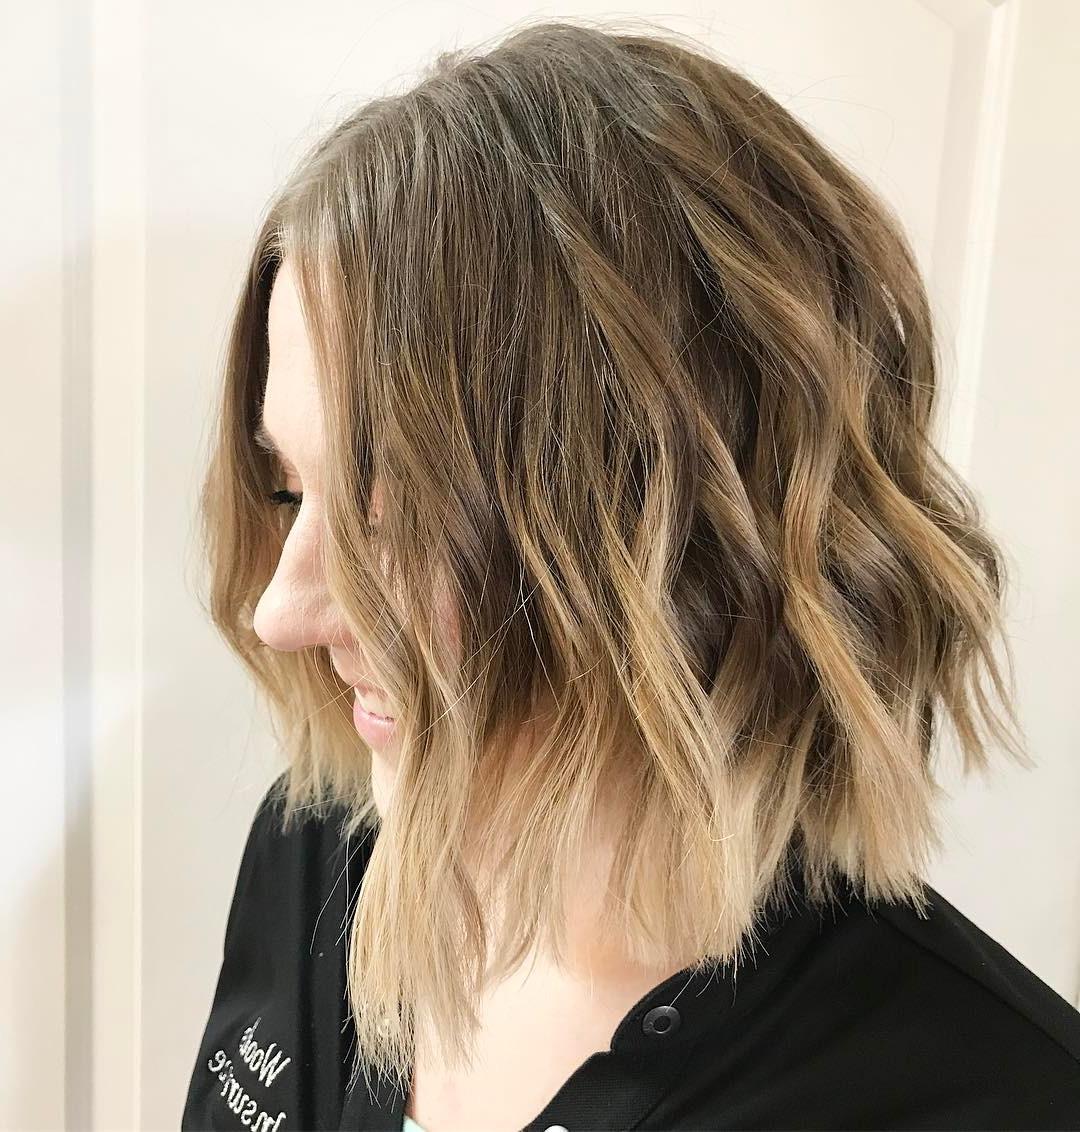 10 Beautiful Medium Bob Haircuts &edgy Looks: Shoulder Length Regarding Choppy Golden Blonde Balayage Bob Hairstyles (View 10 of 20)